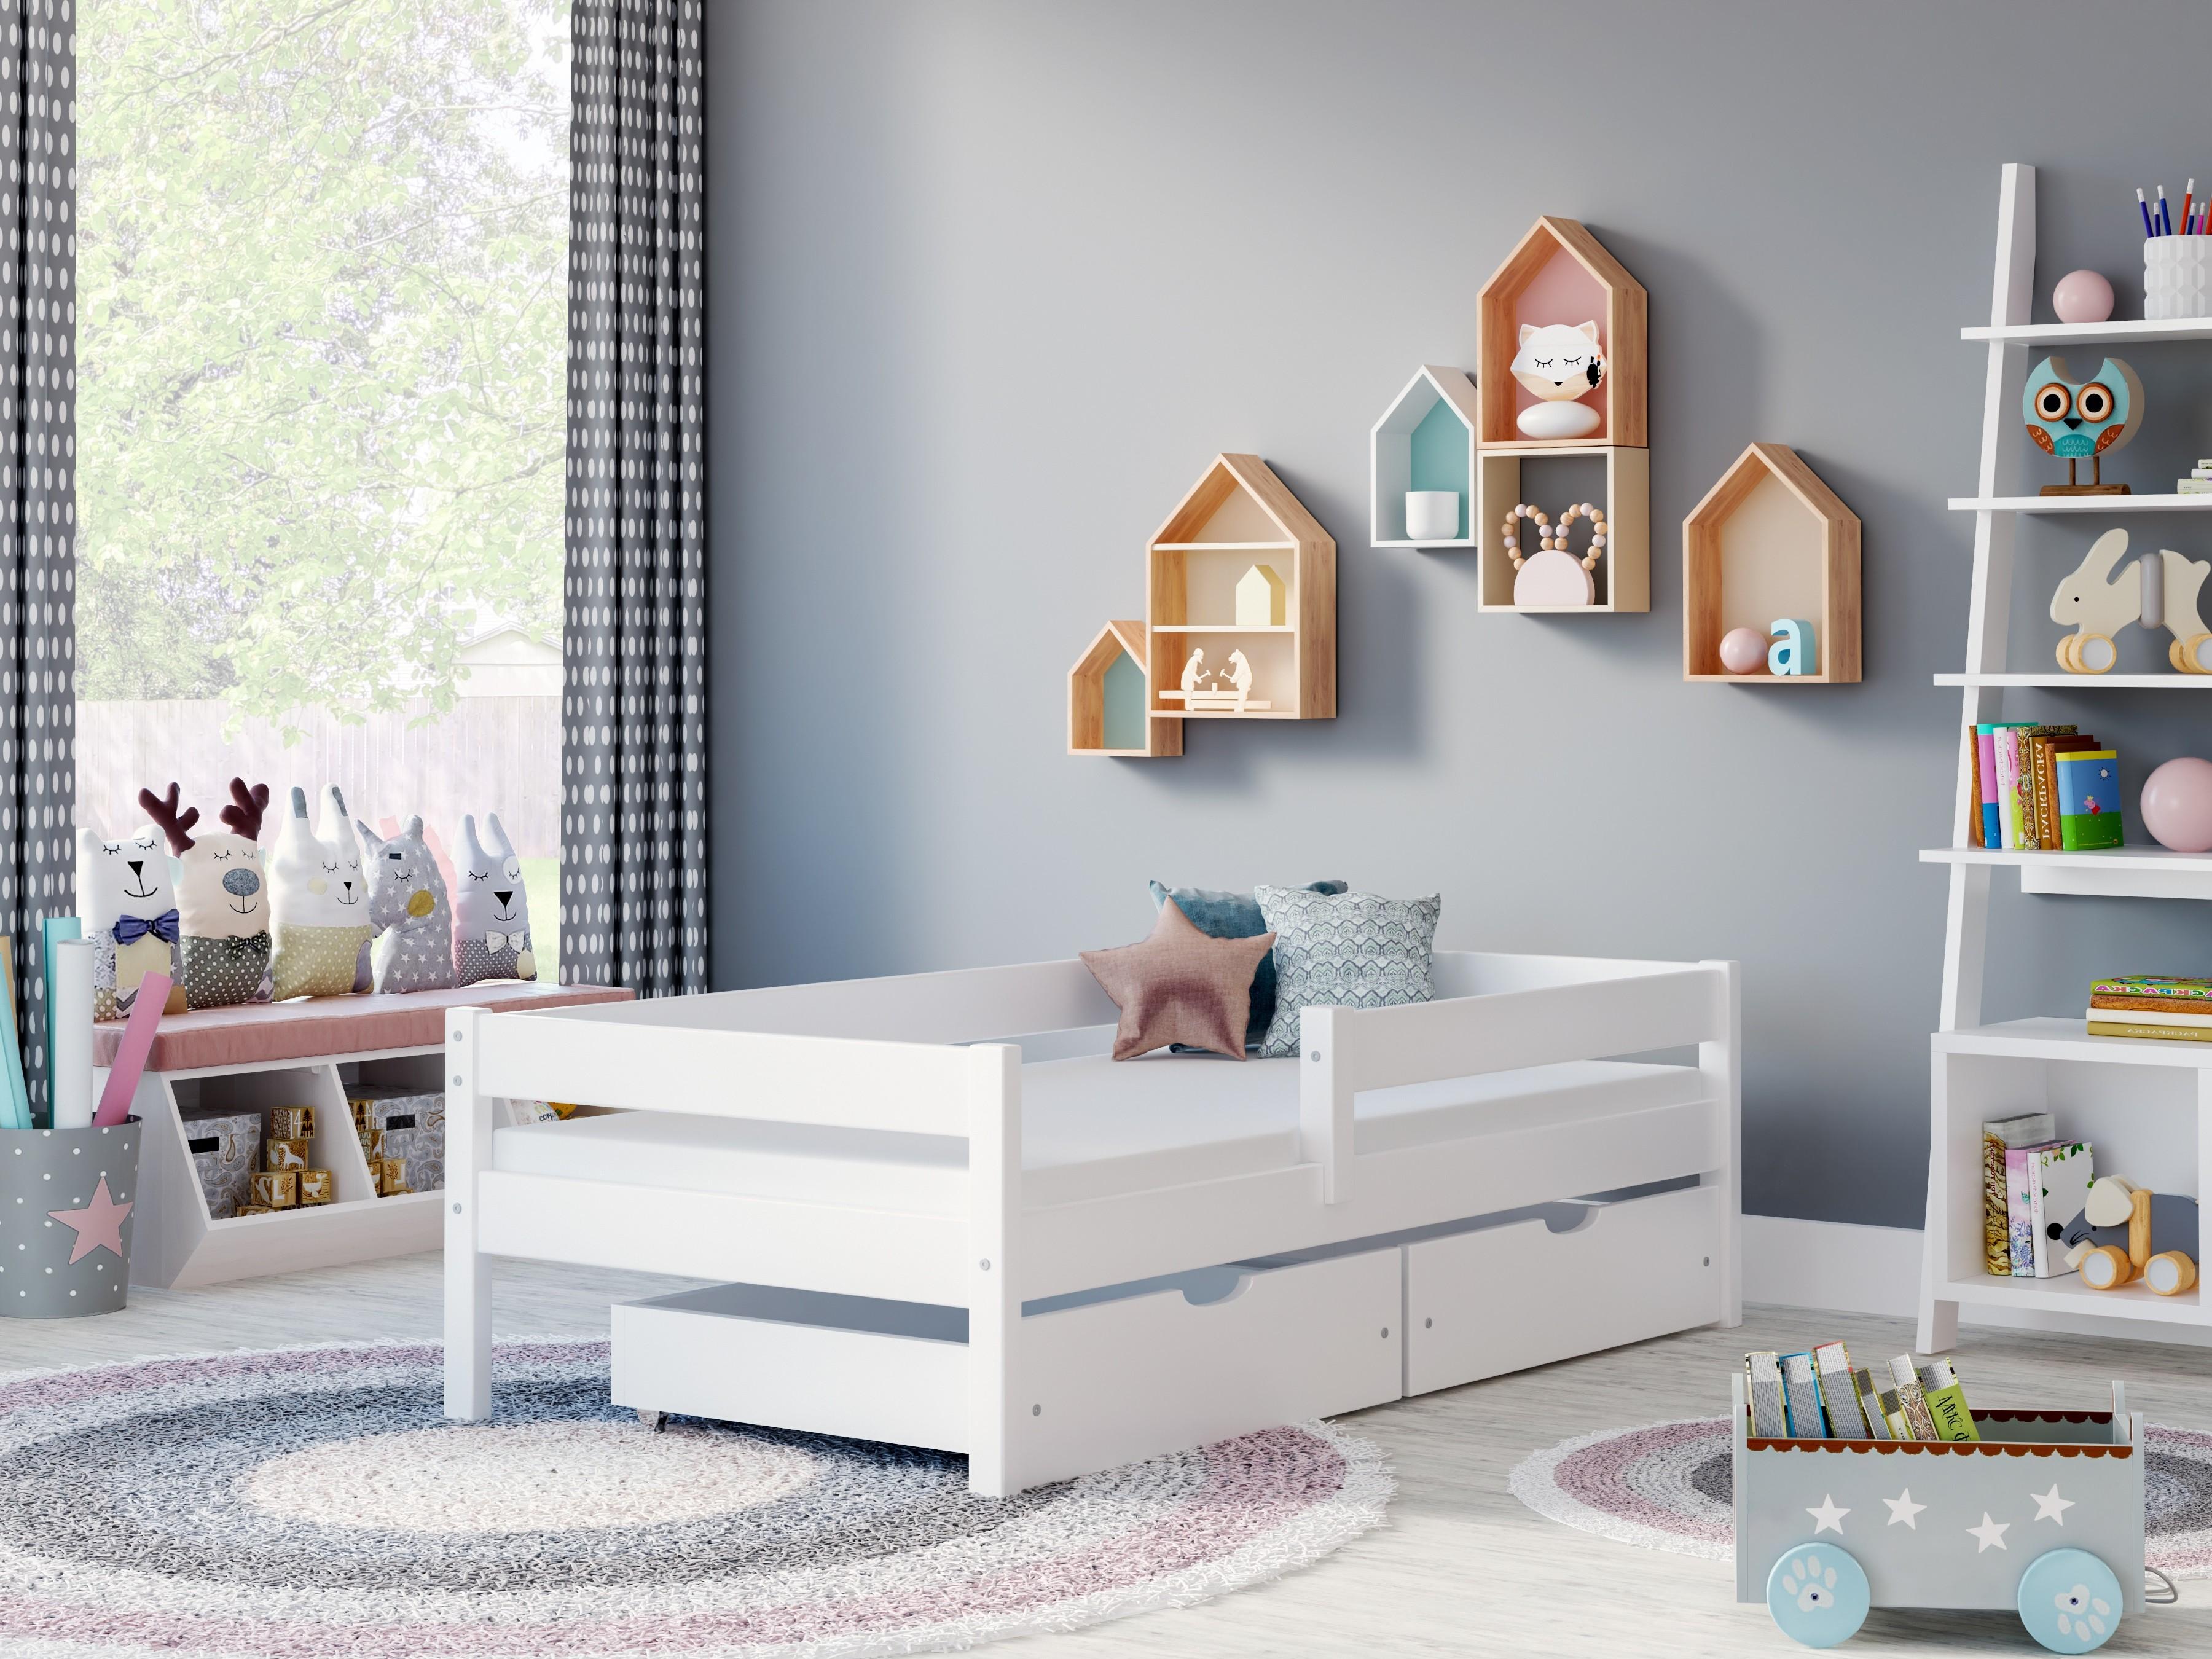 Samostatná postel Filip - bílá bez zásuvek